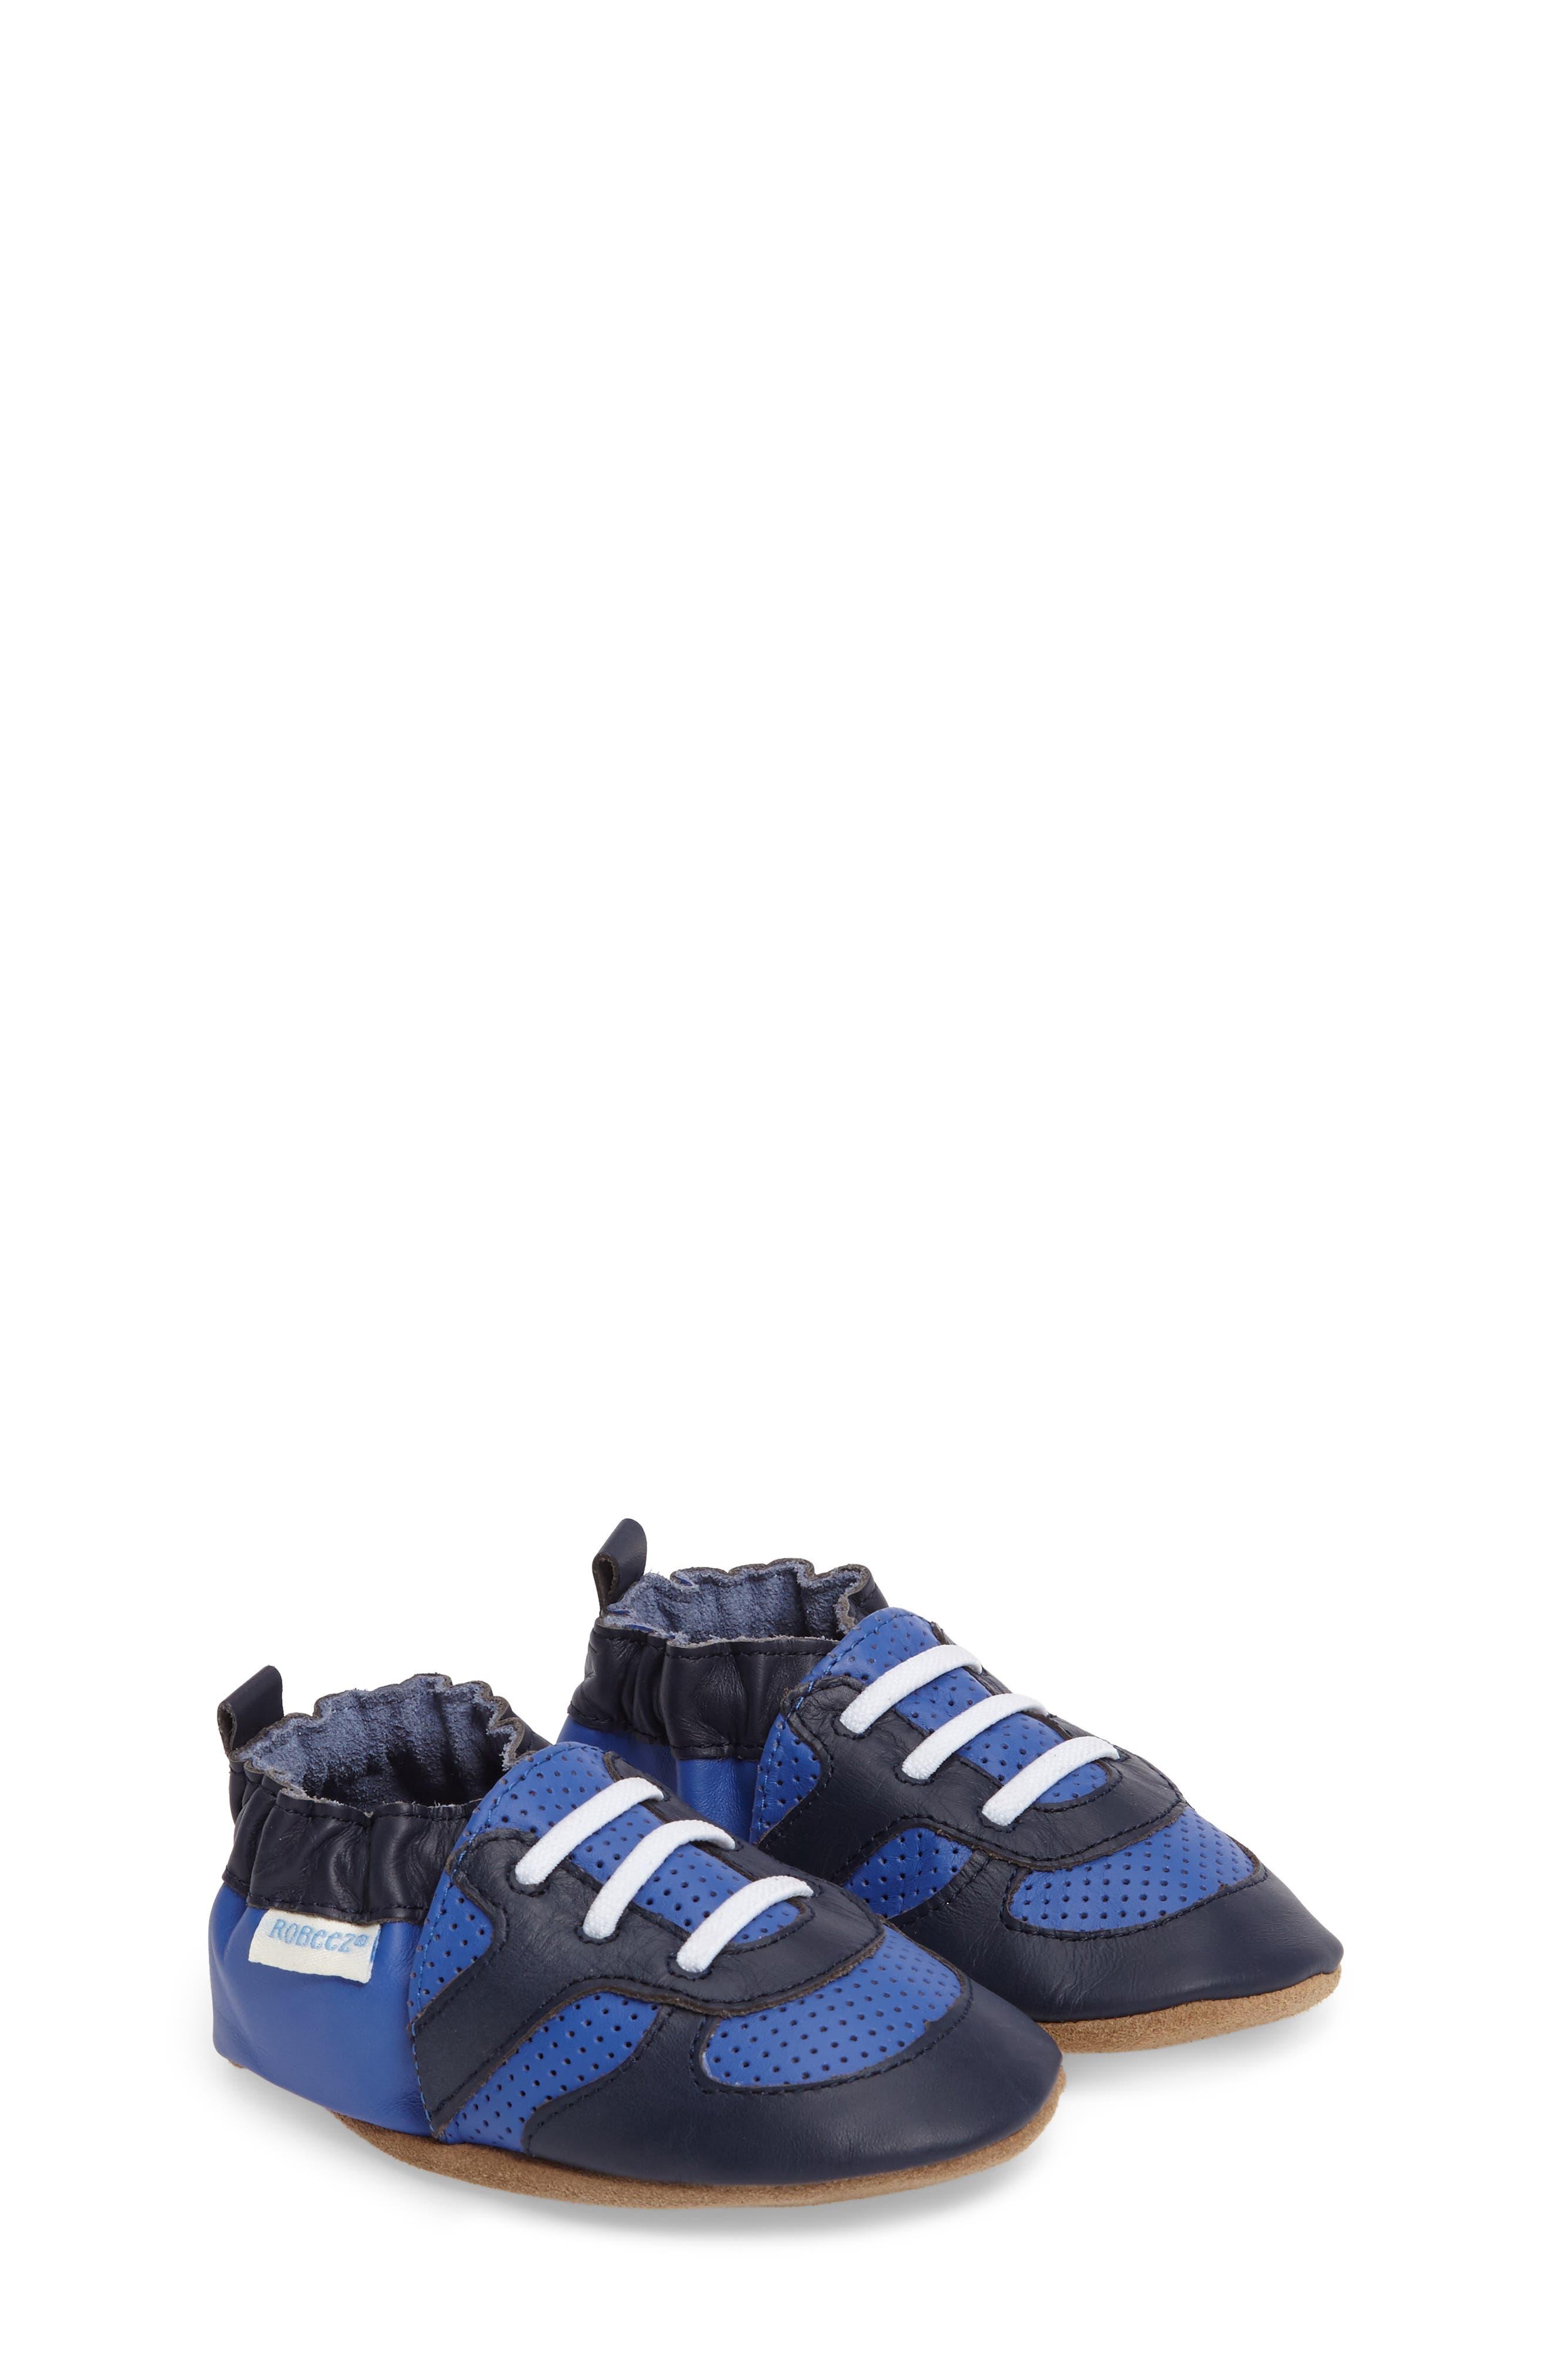 Alternate Image 1 Selected - Robeez® 'Super Sporty' Crib Shoe (Baby & Walker)